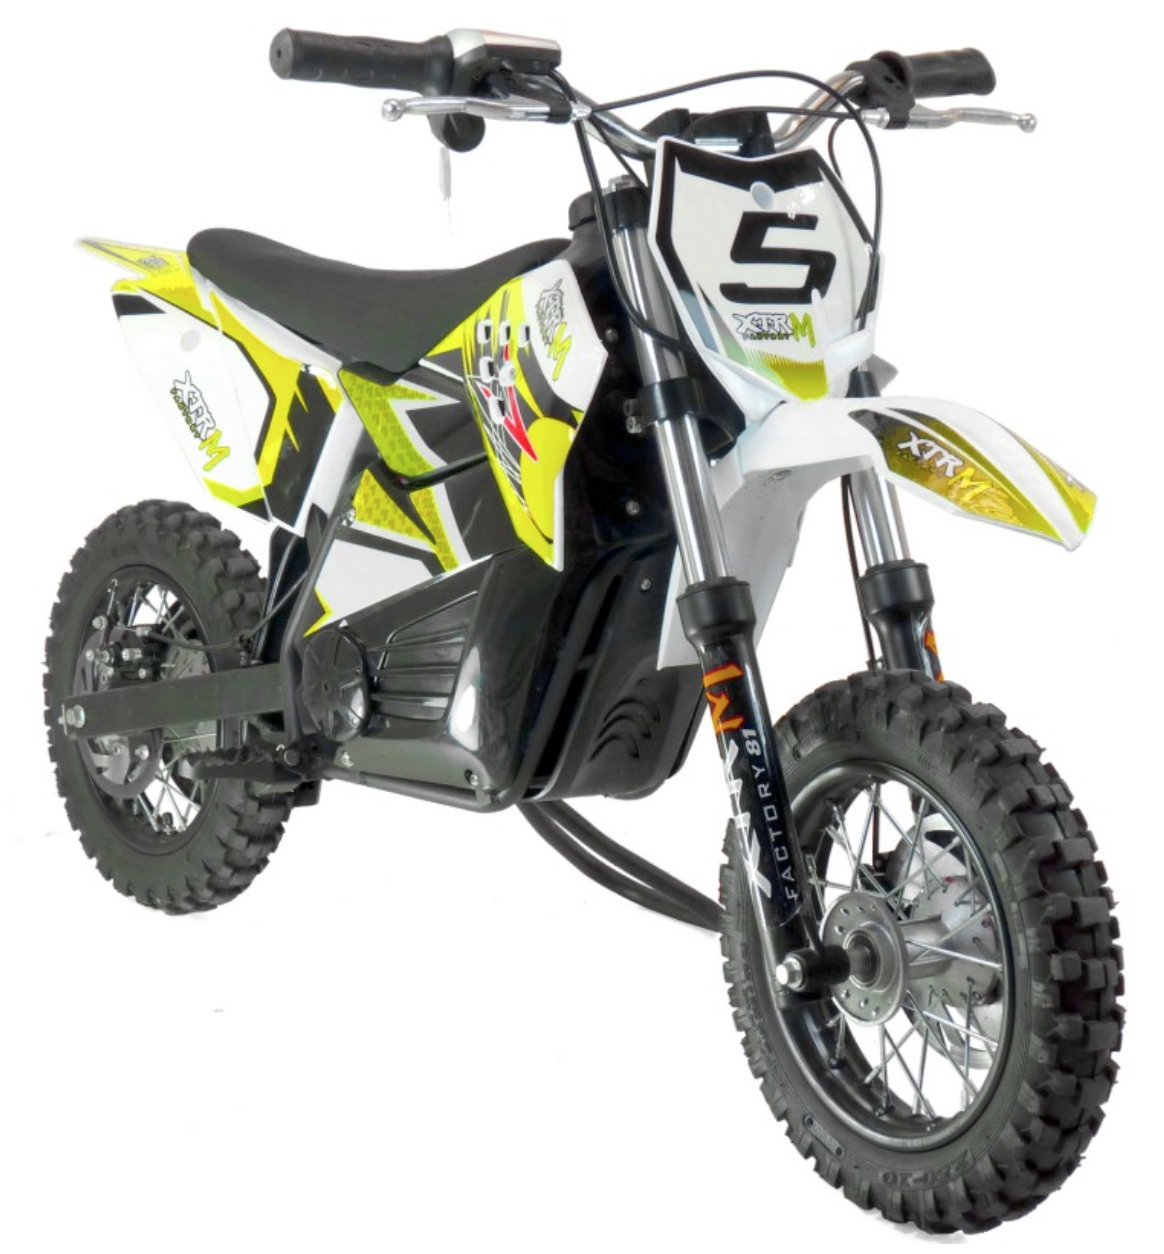 moto cross electrique 800w 10 10 jaune. Black Bedroom Furniture Sets. Home Design Ideas